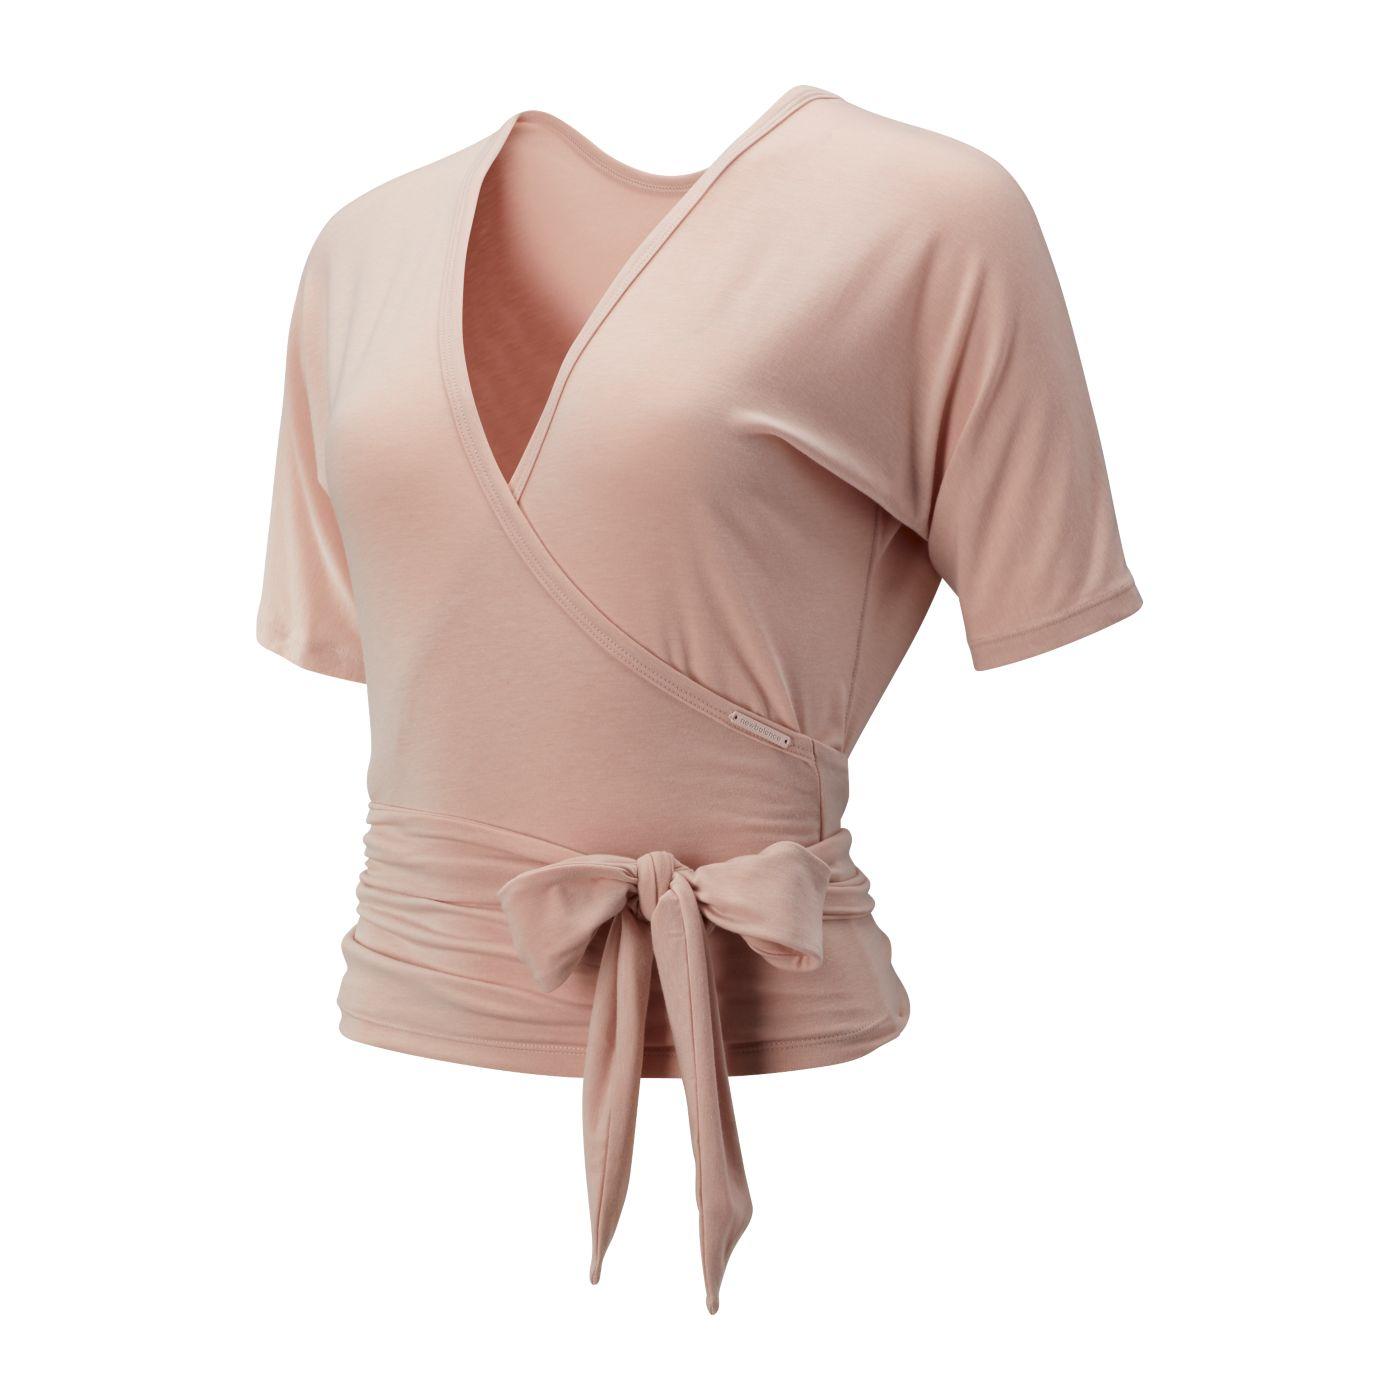 New Balance Women's Balance Wrap T-Shirt